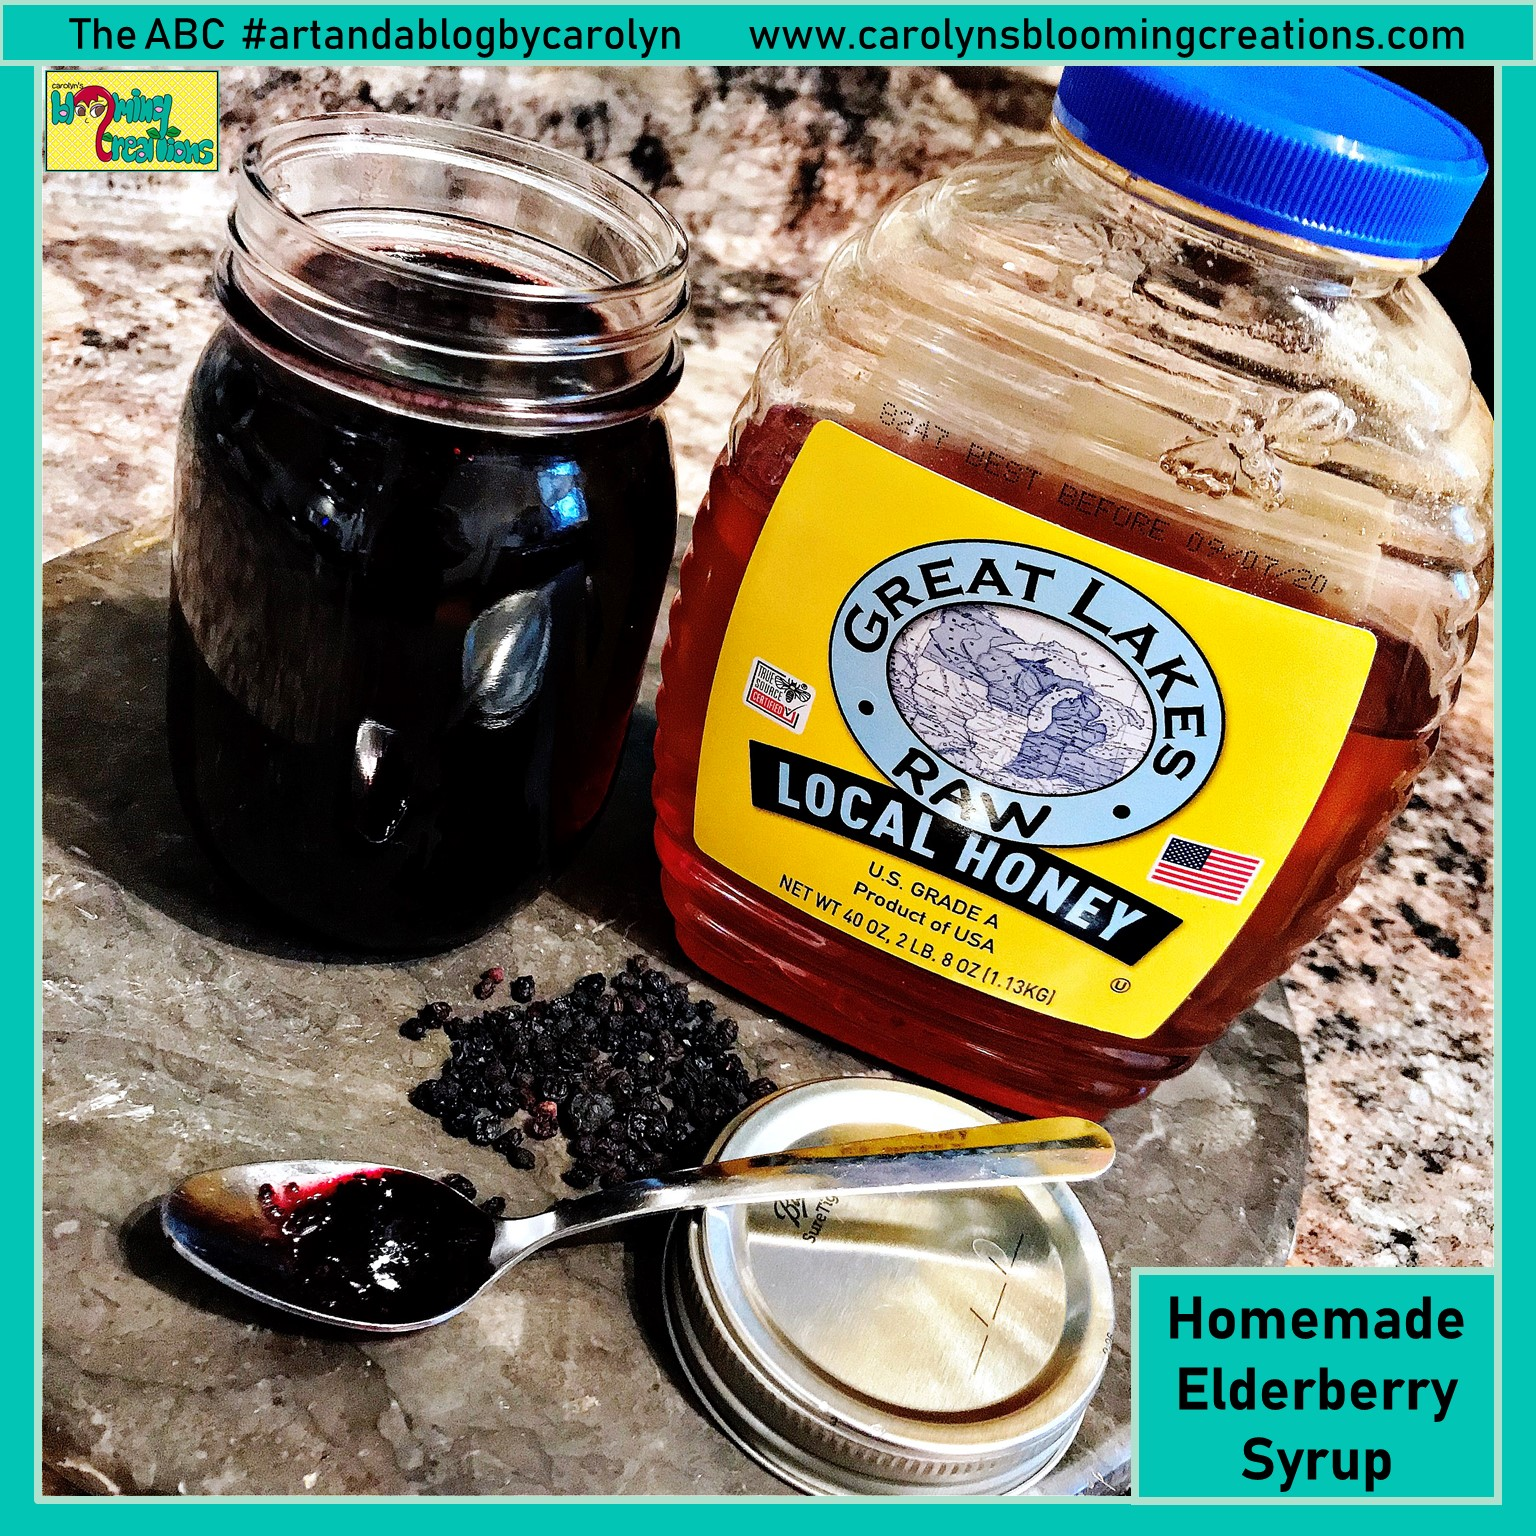 I made my own Elderberry Syrup using Wellness Mama's recipe!